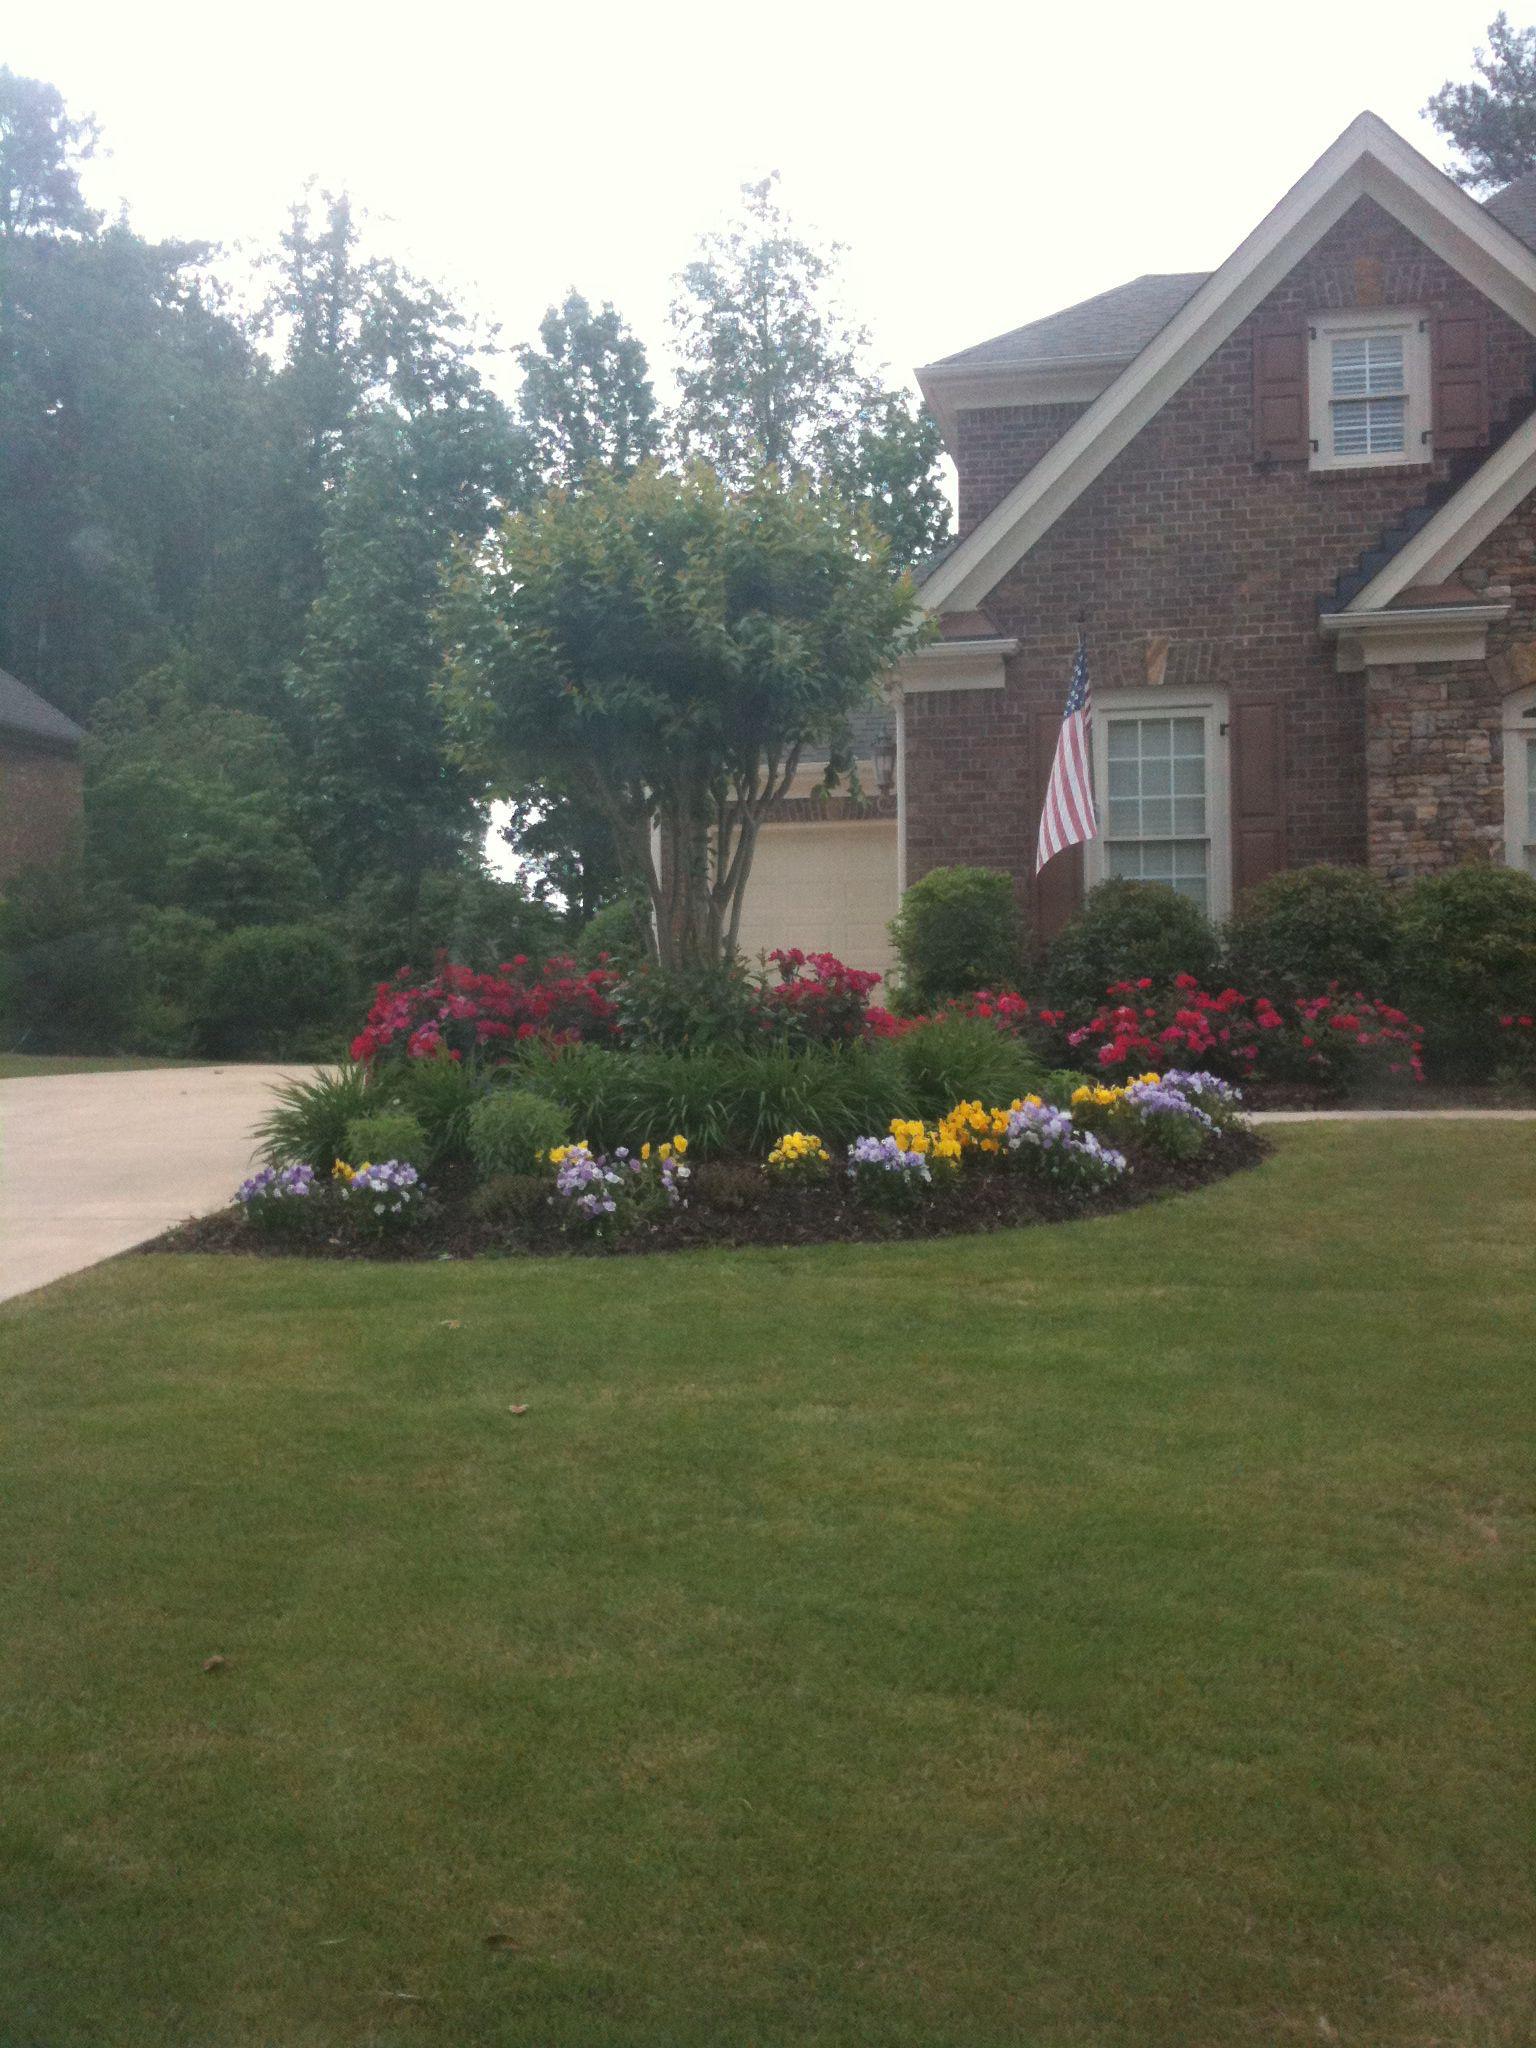 Landscaping The Corner Where The Driveway + Sidewalk Meet